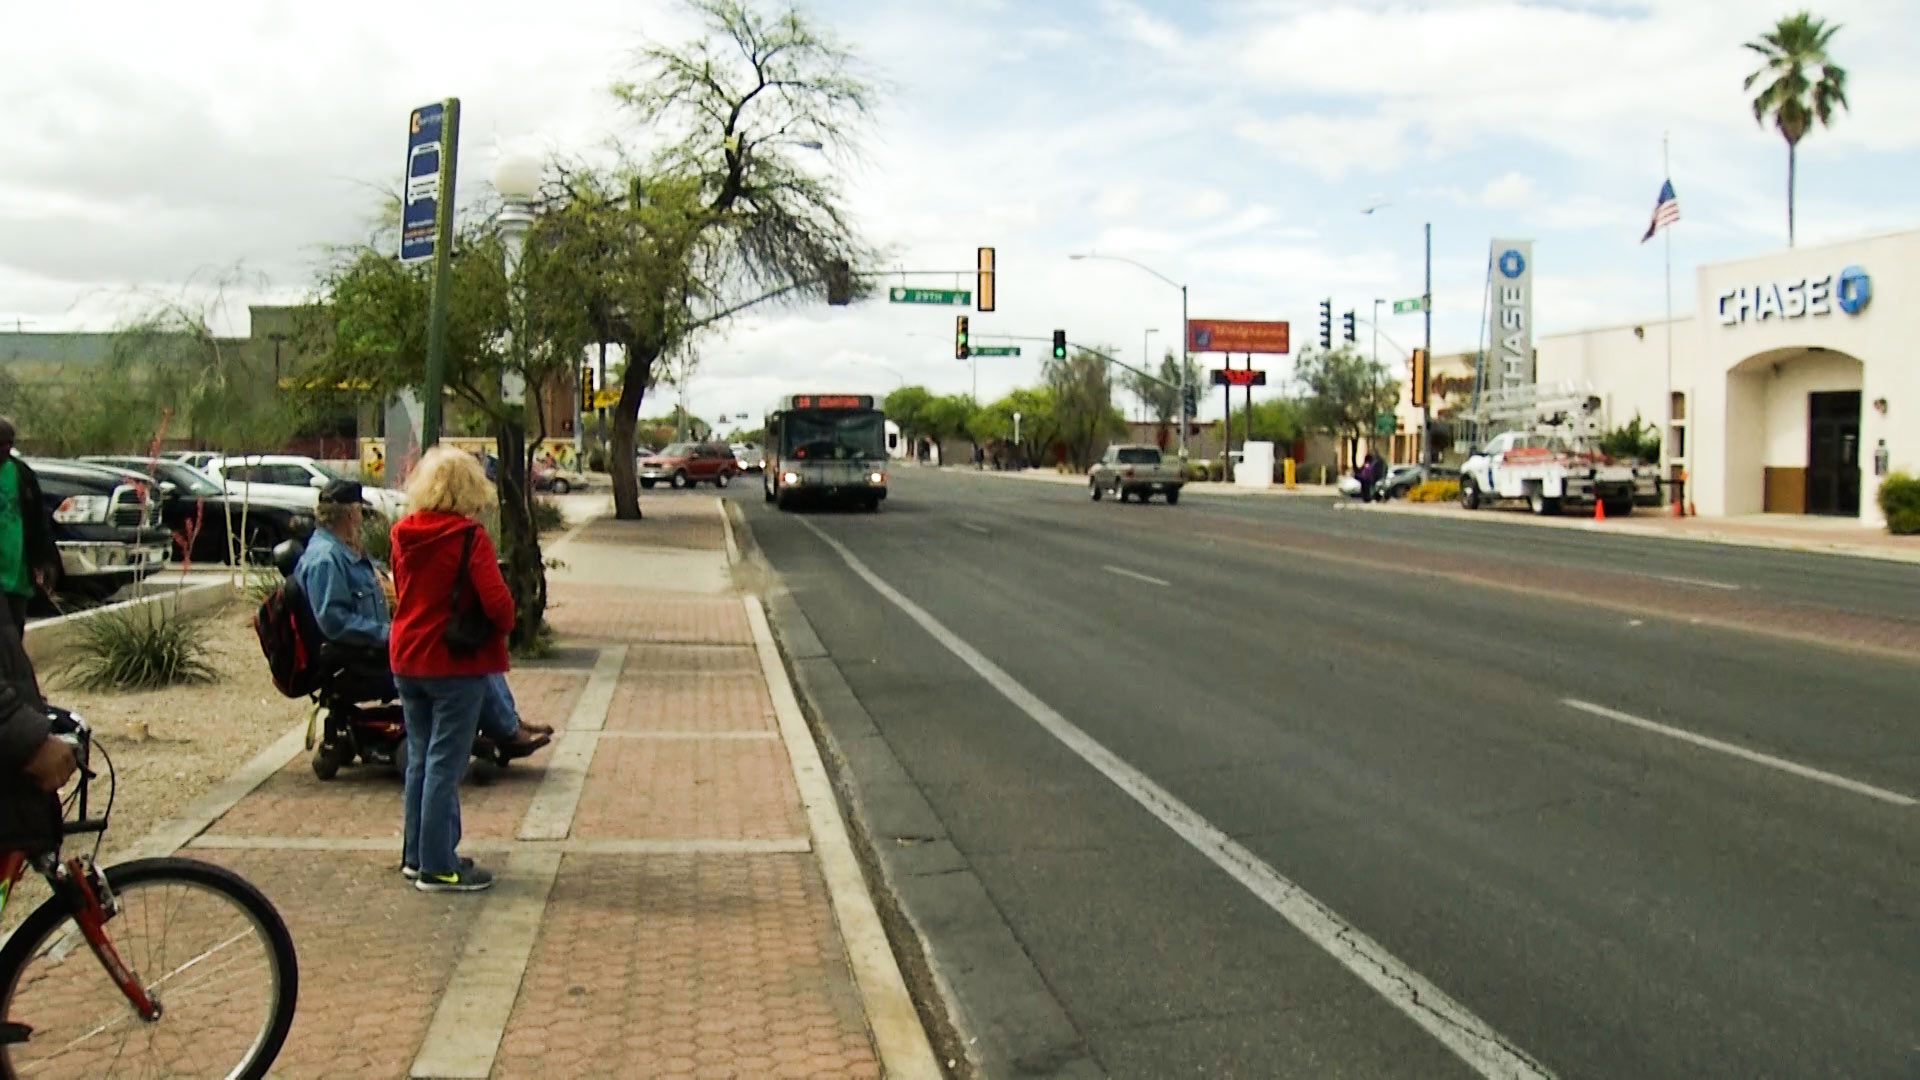 South Tucson street